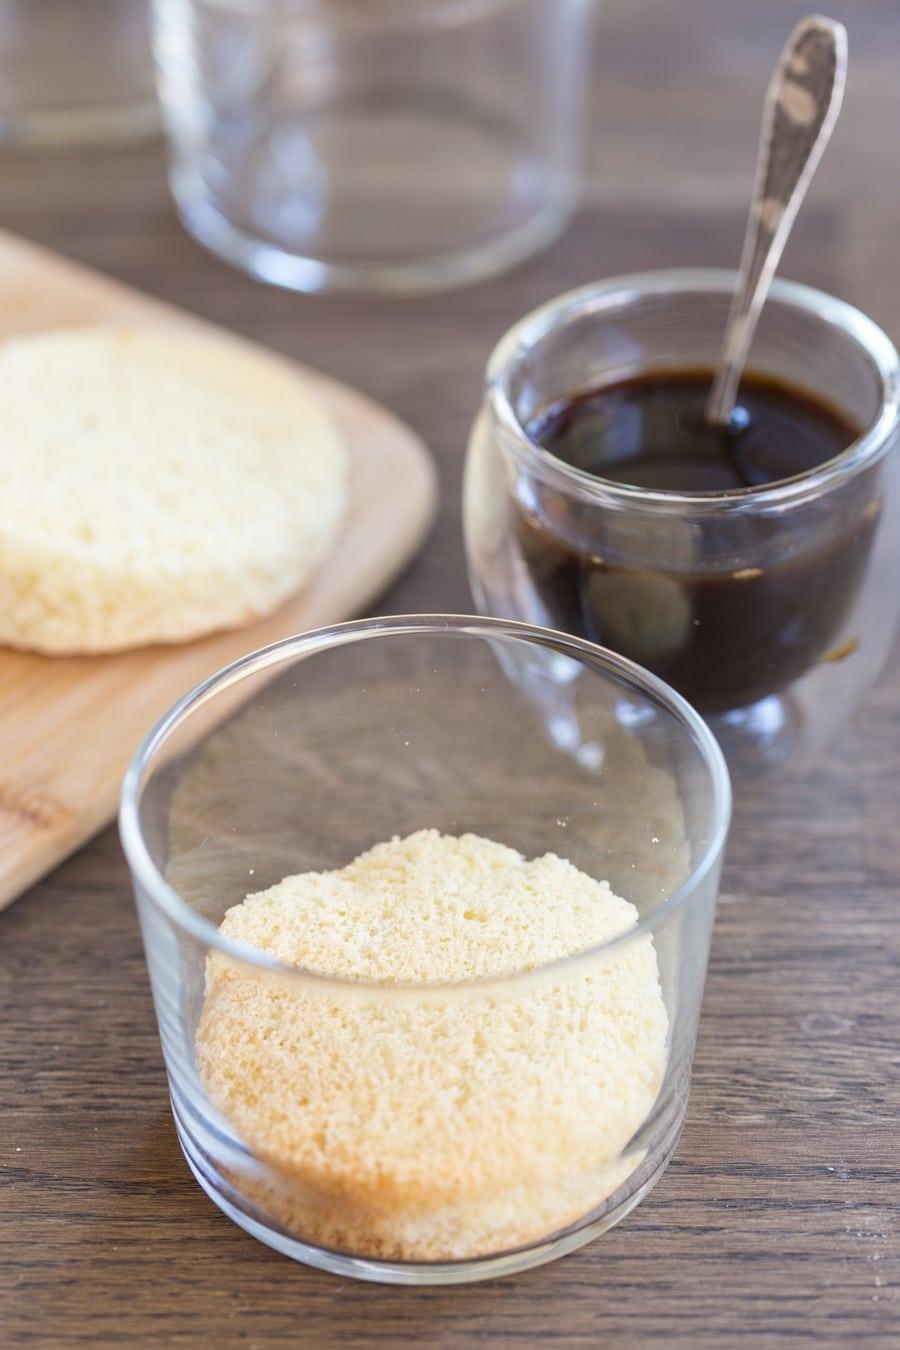 Tiramisu in a glass procedure: add the sponge cake to a glass.